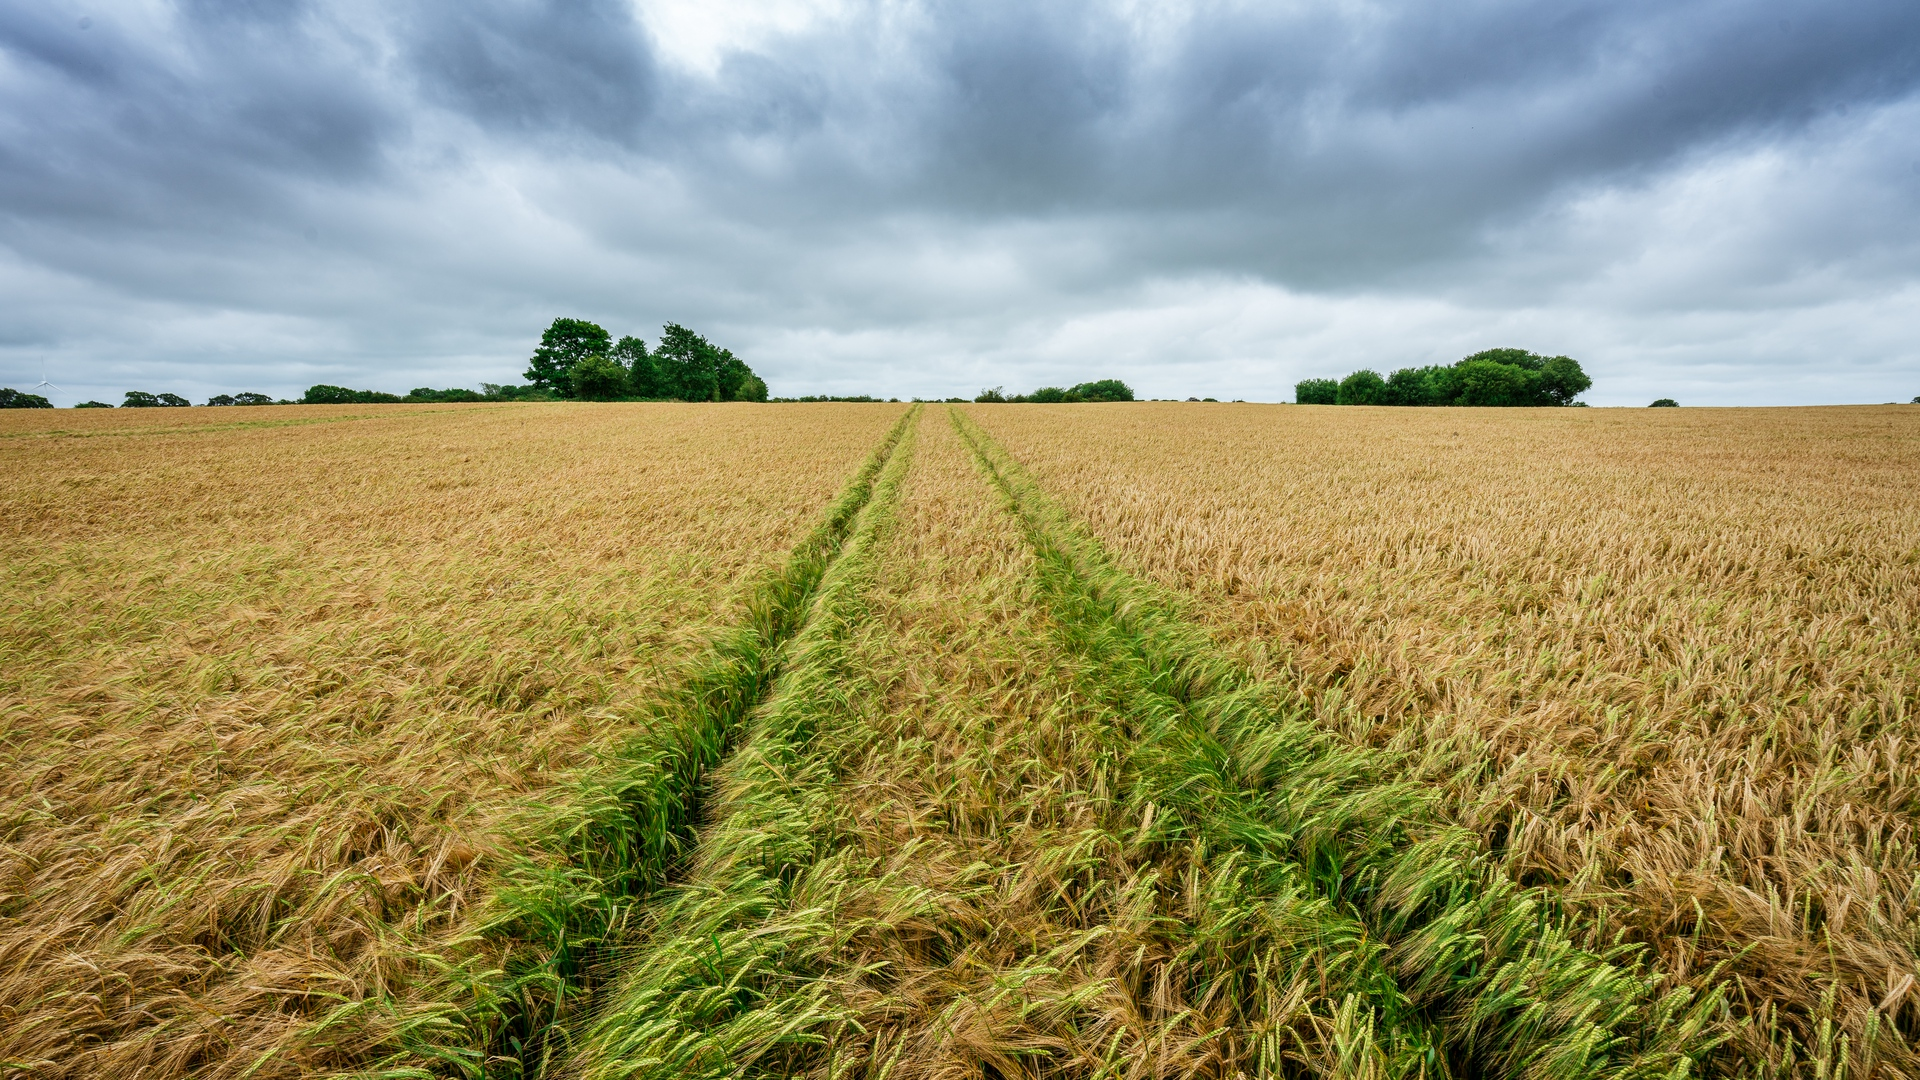 Download wallpaper 1920x1080 field rye spikelets harvest 1920x1080